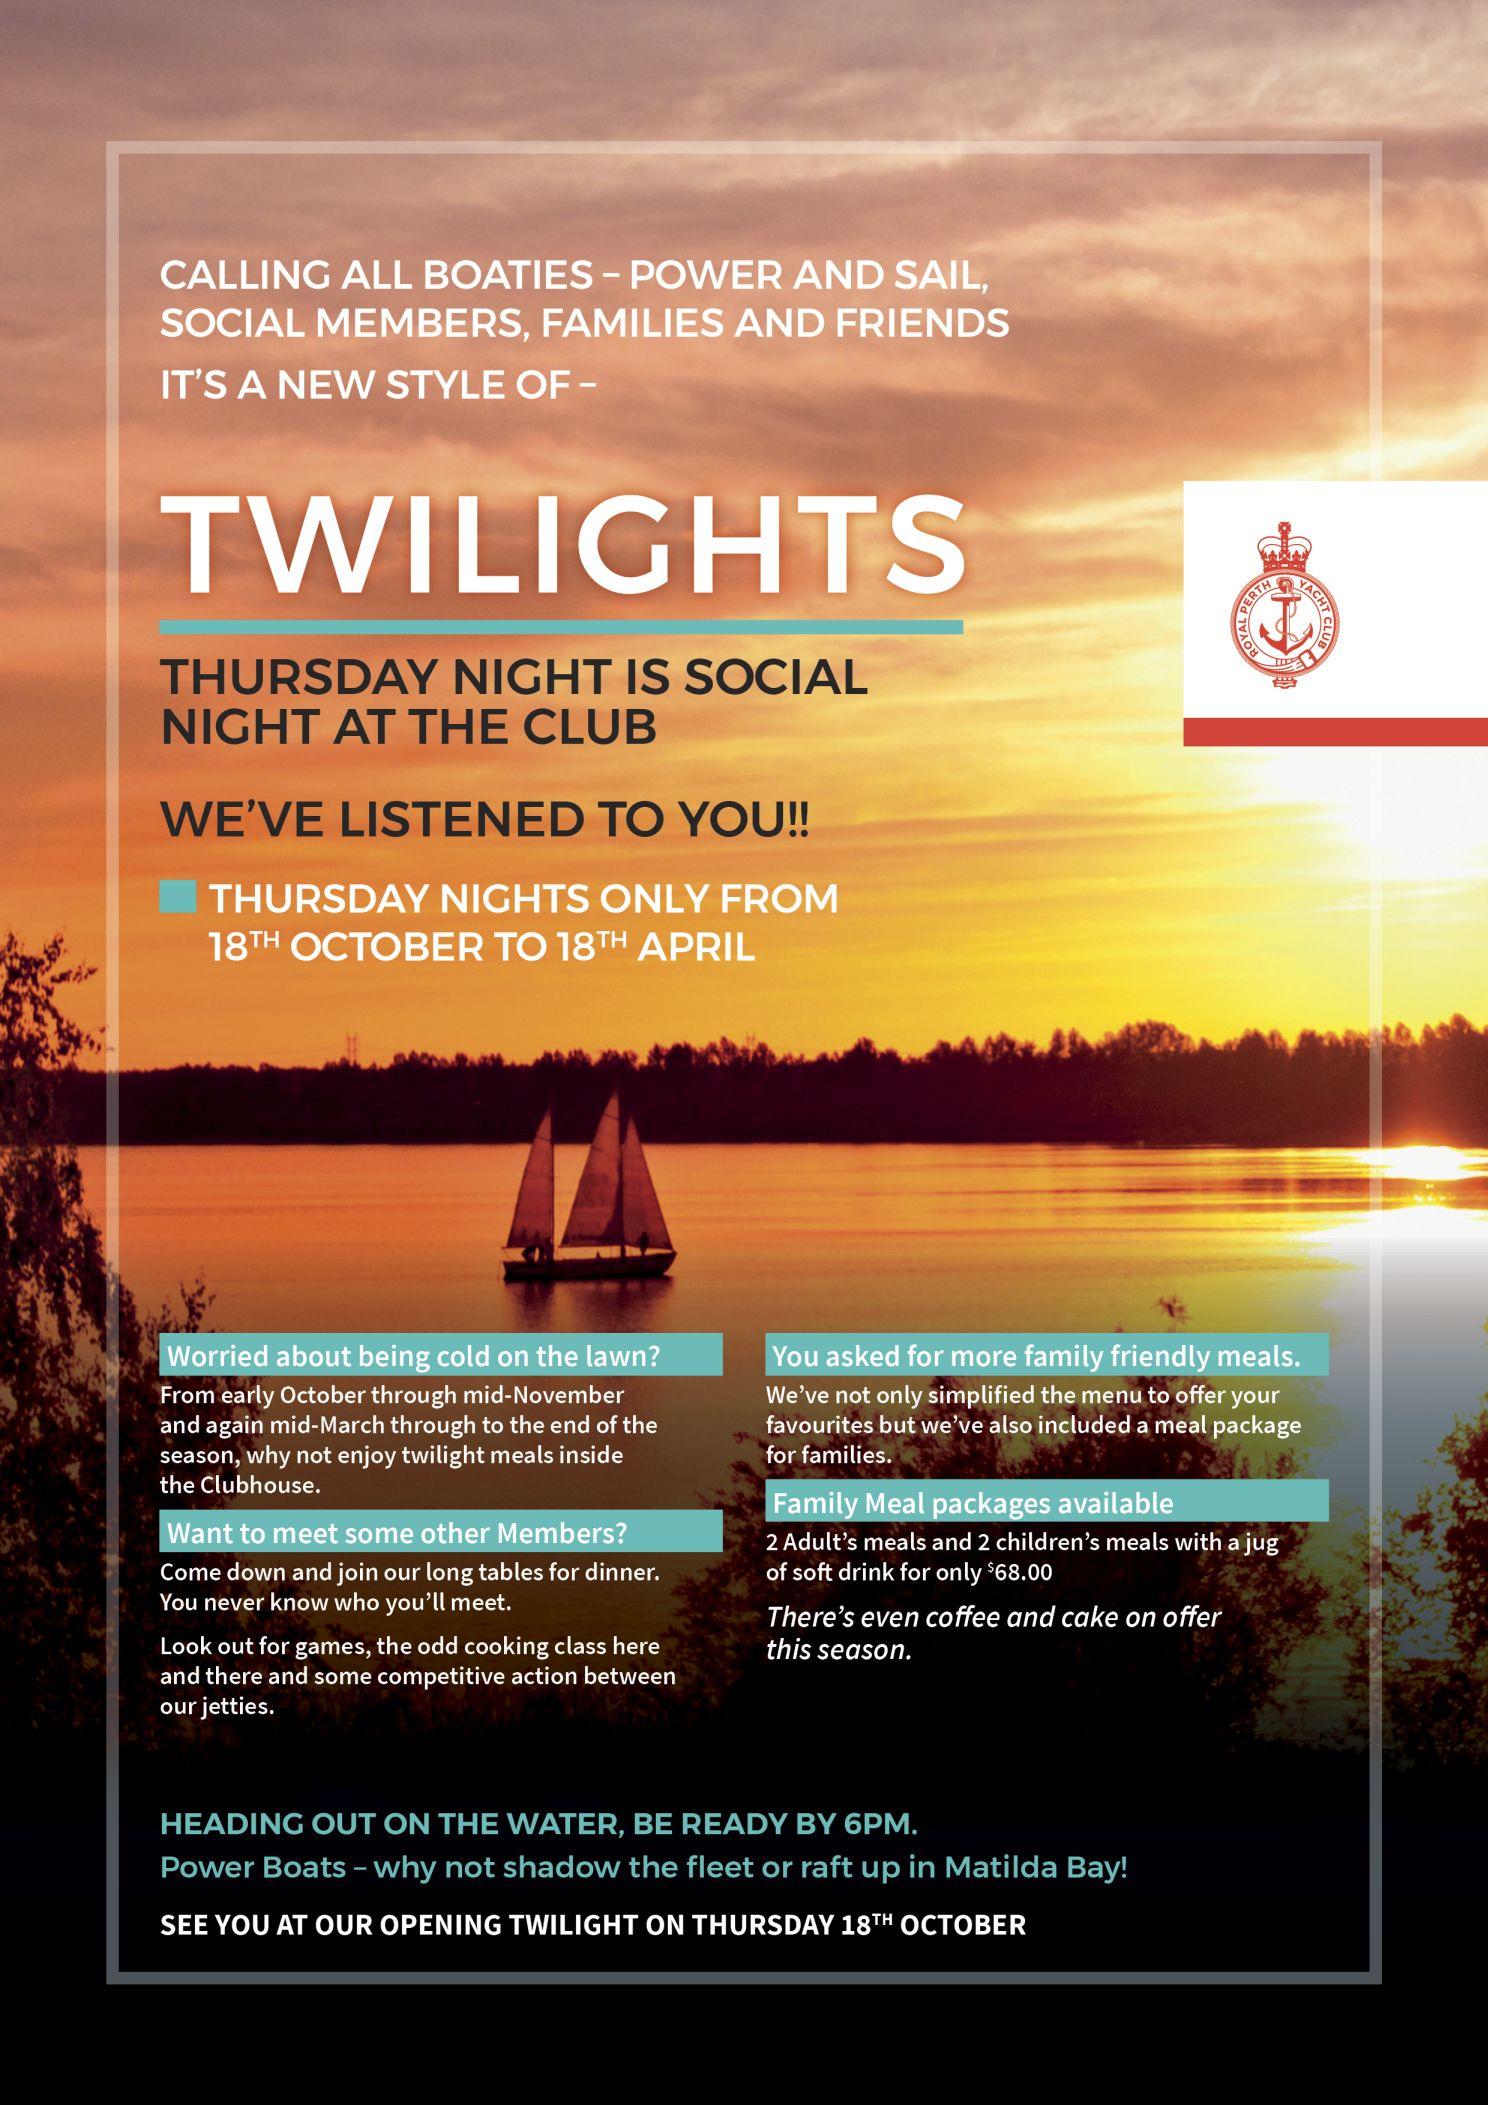 ITW Oct 2018 Twilights